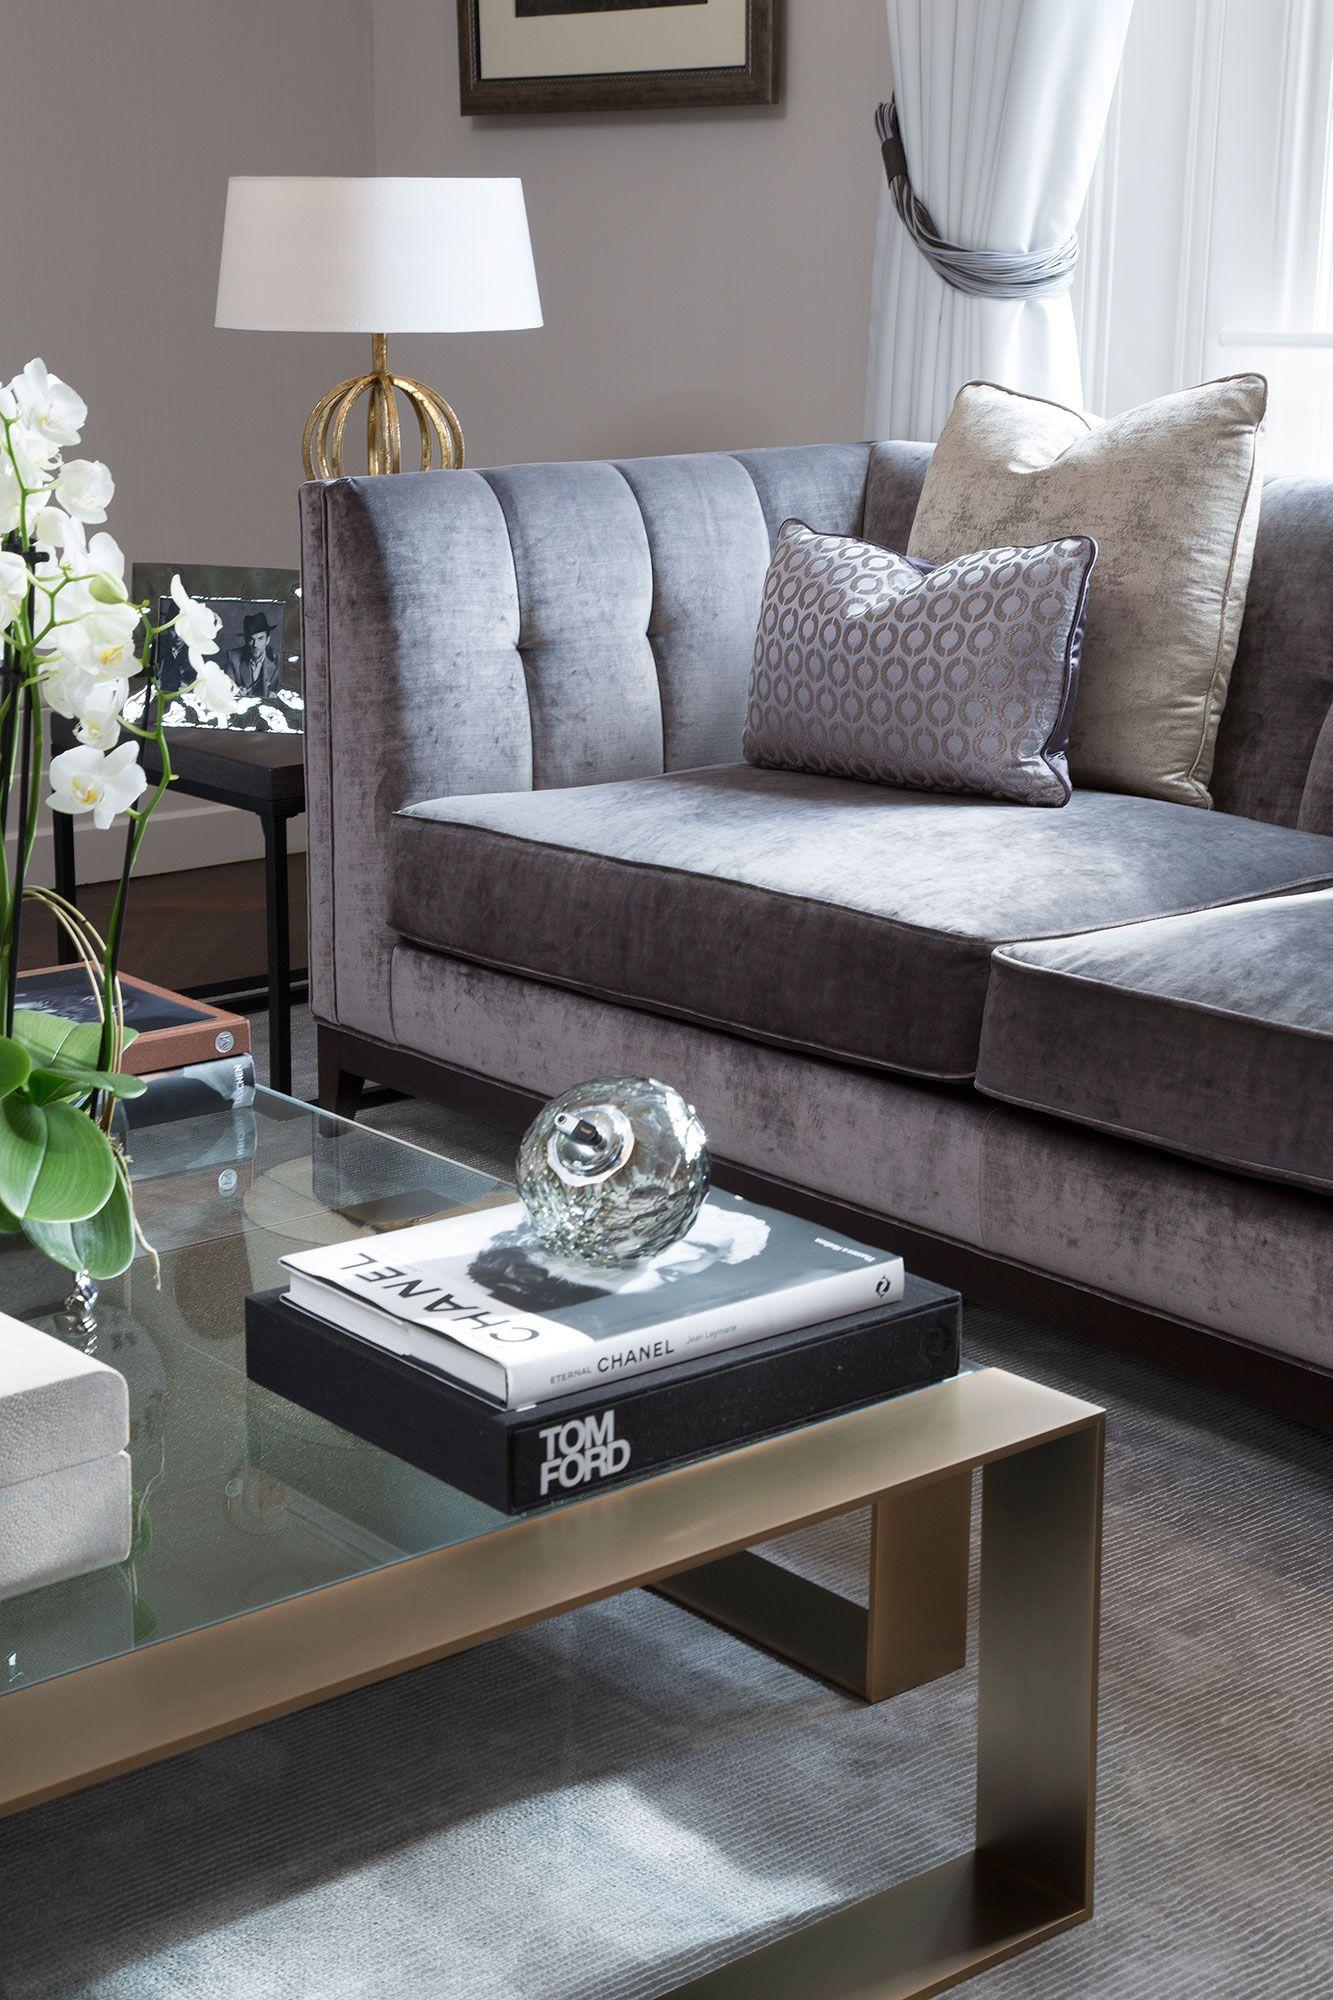 Luxurious Living Room Designs: Luxury Home Design & Decor